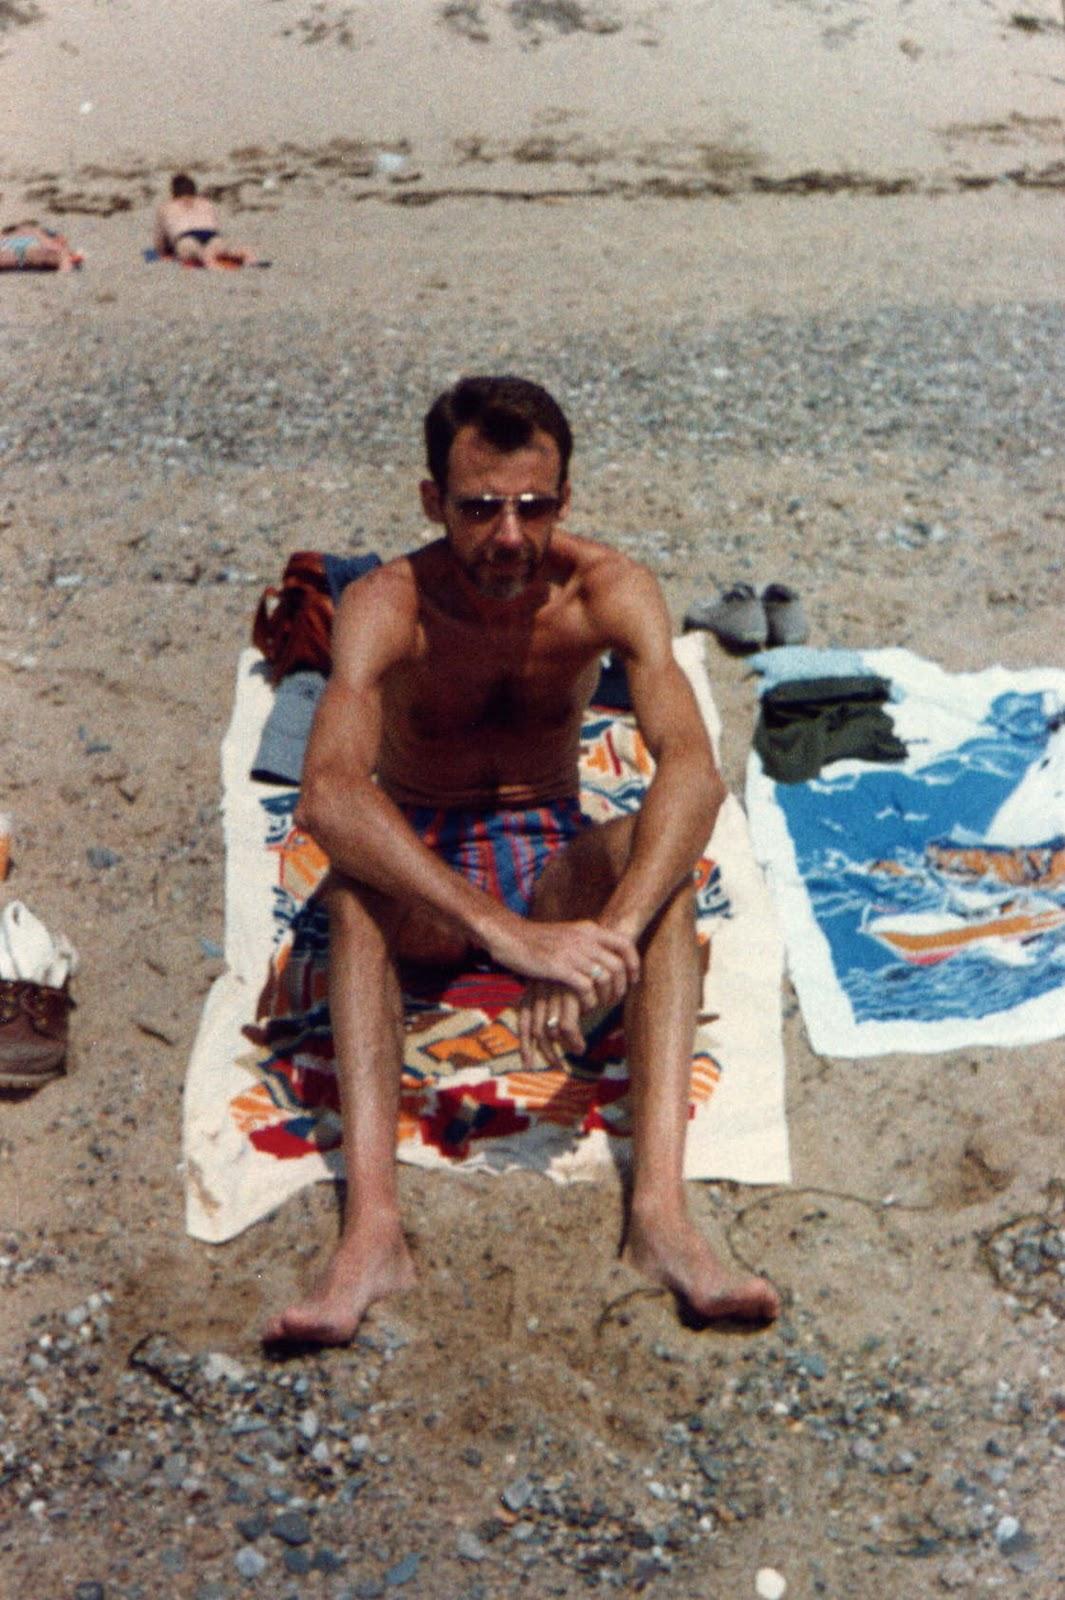 Beach men nude tanning picture 522